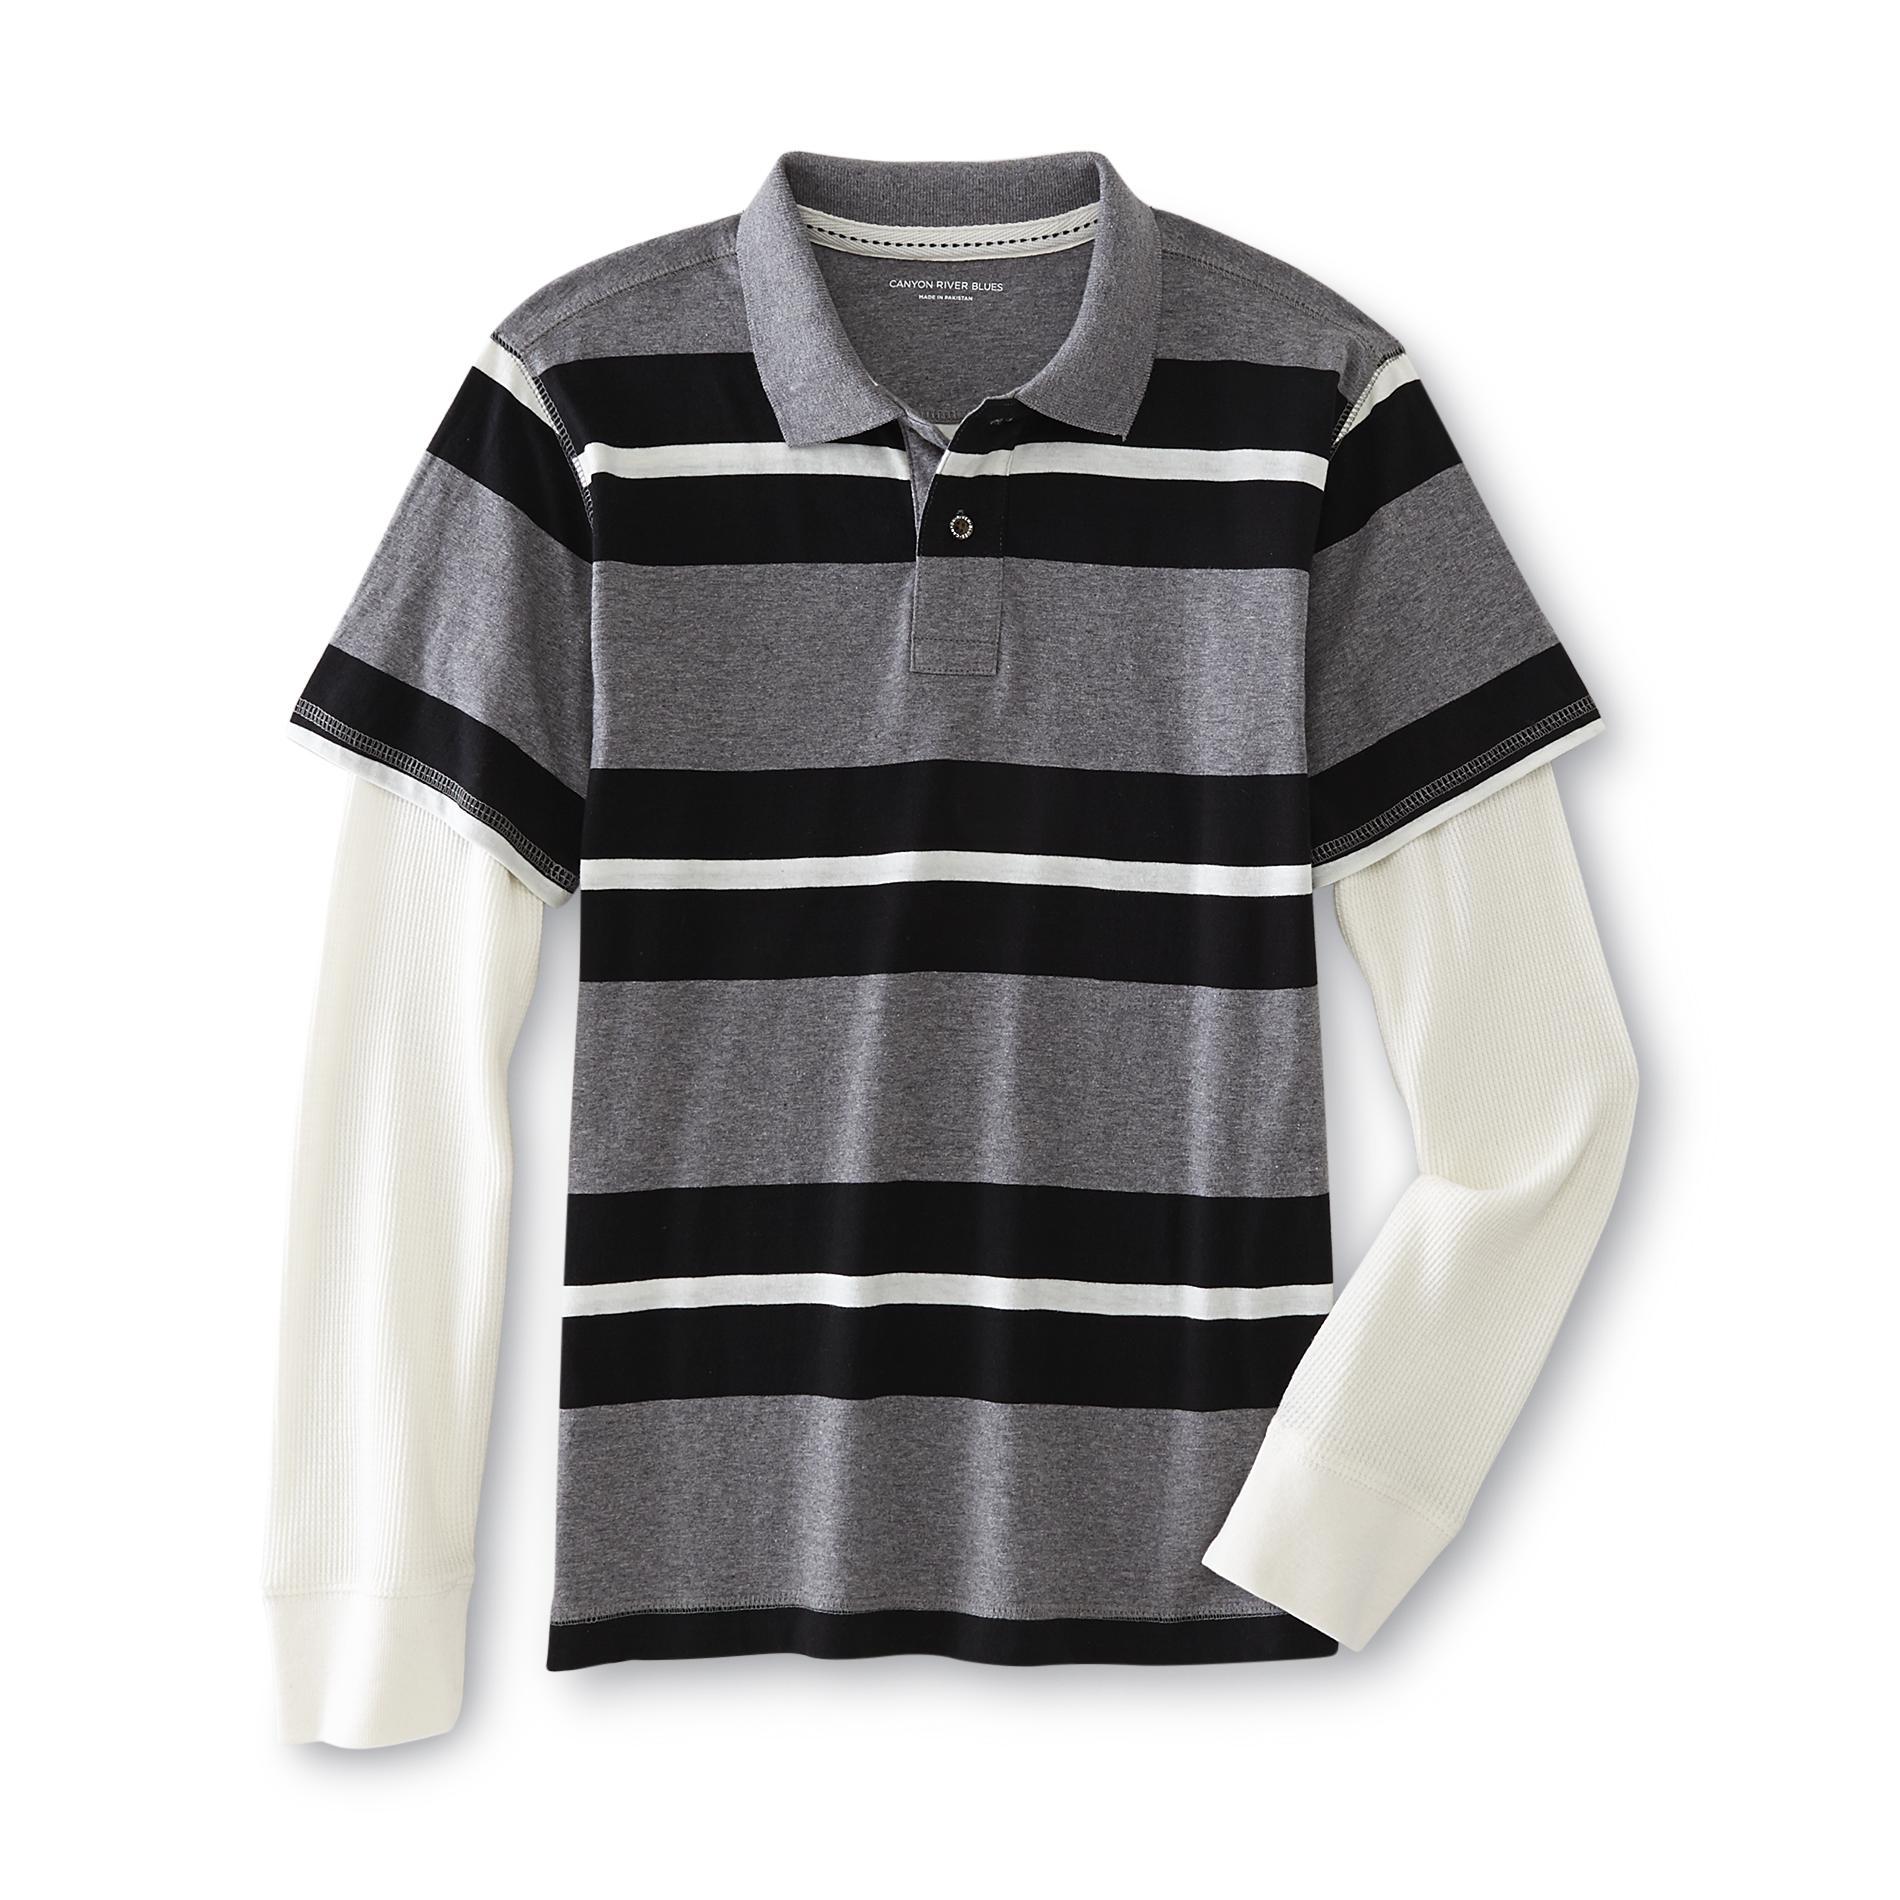 Canyon River Blues Boy's Layered-Look Polo Shirt - Striped